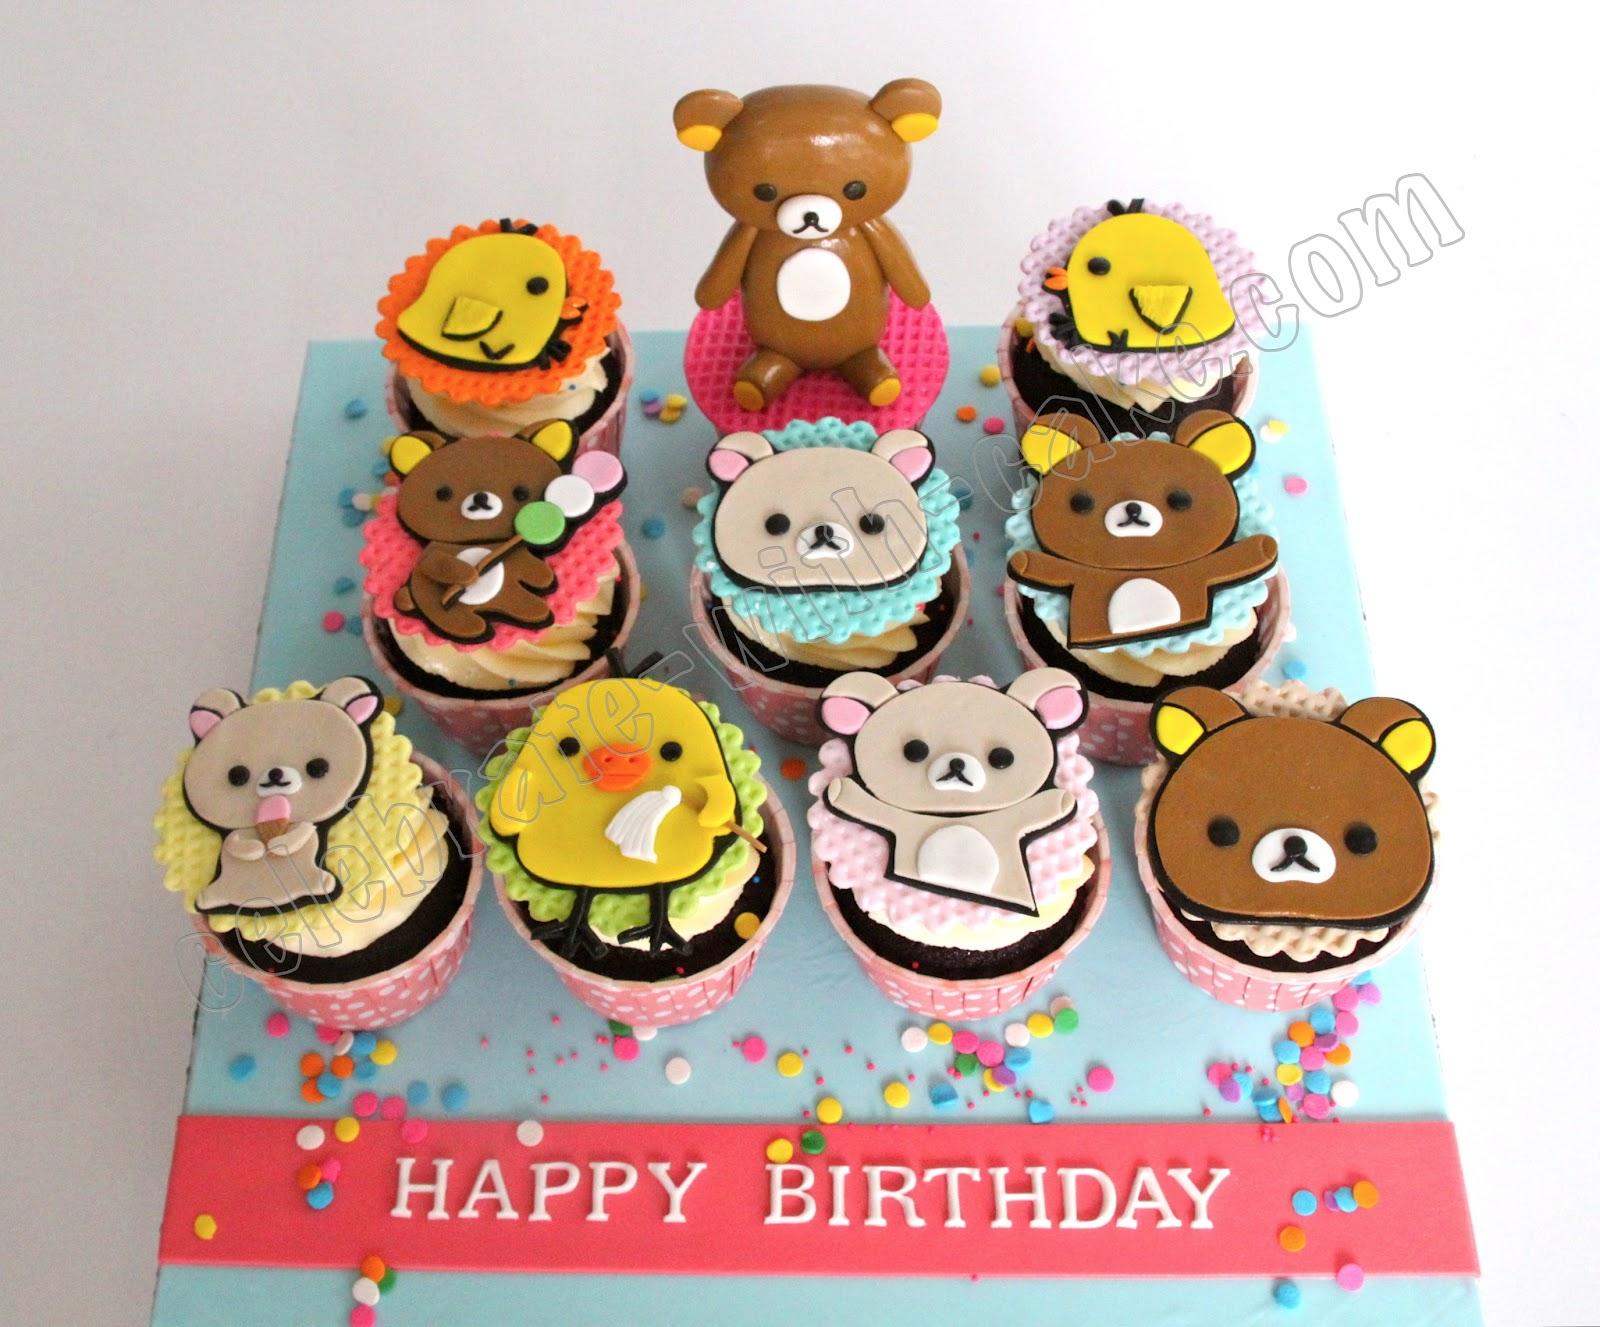 Celebrate With Cake Rilakkuma Cupakes